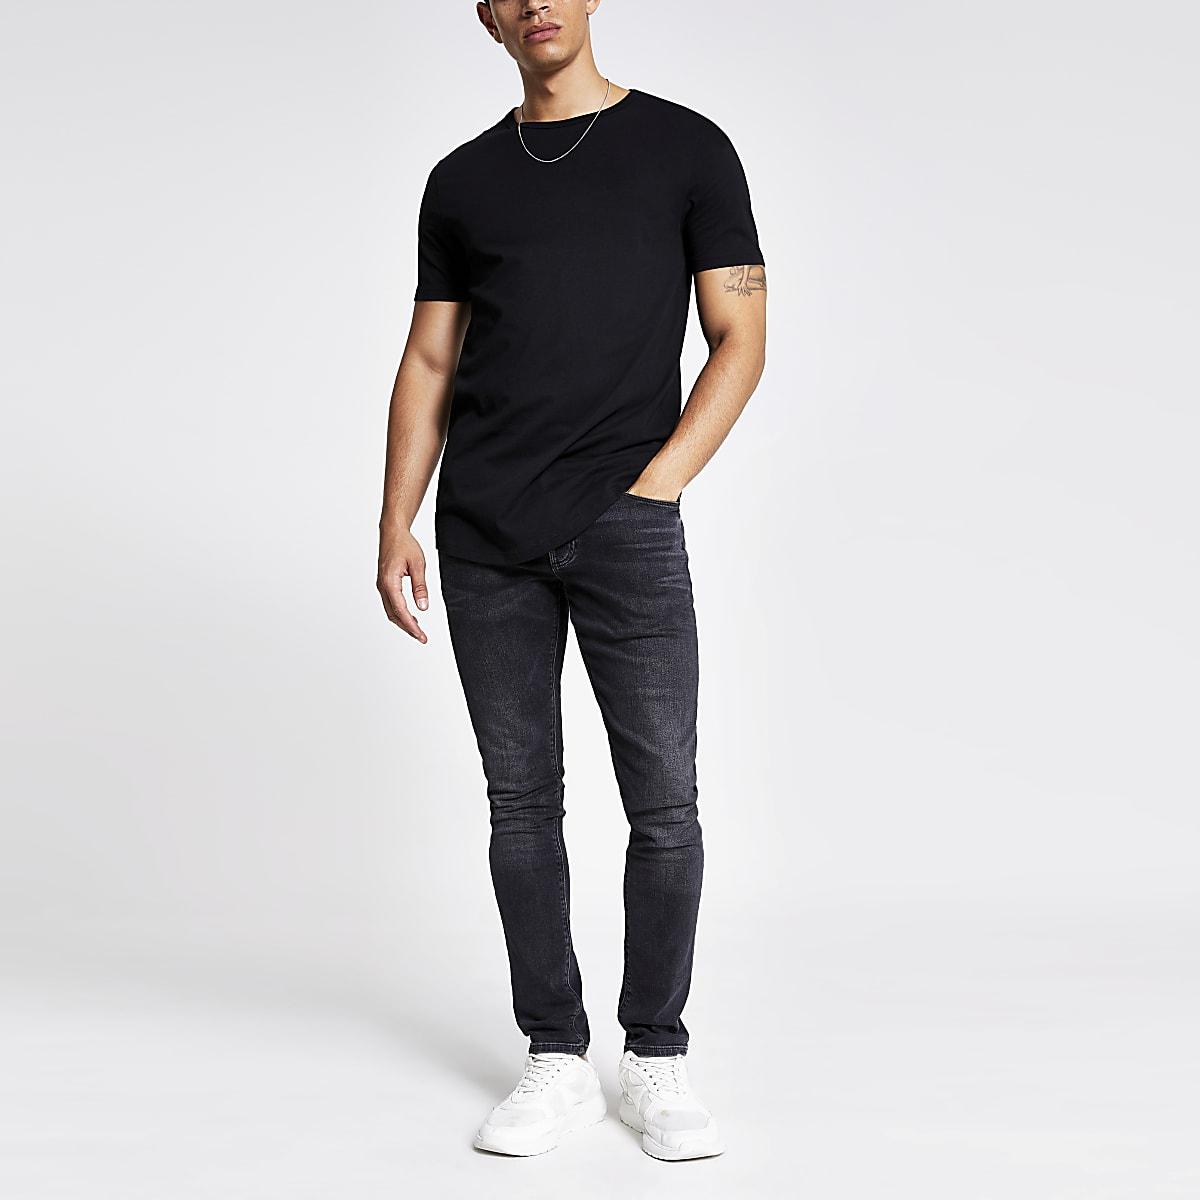 0062d29b426 Black curved hem longline T-shirt - T-shirts - T-Shirts   Vests - men